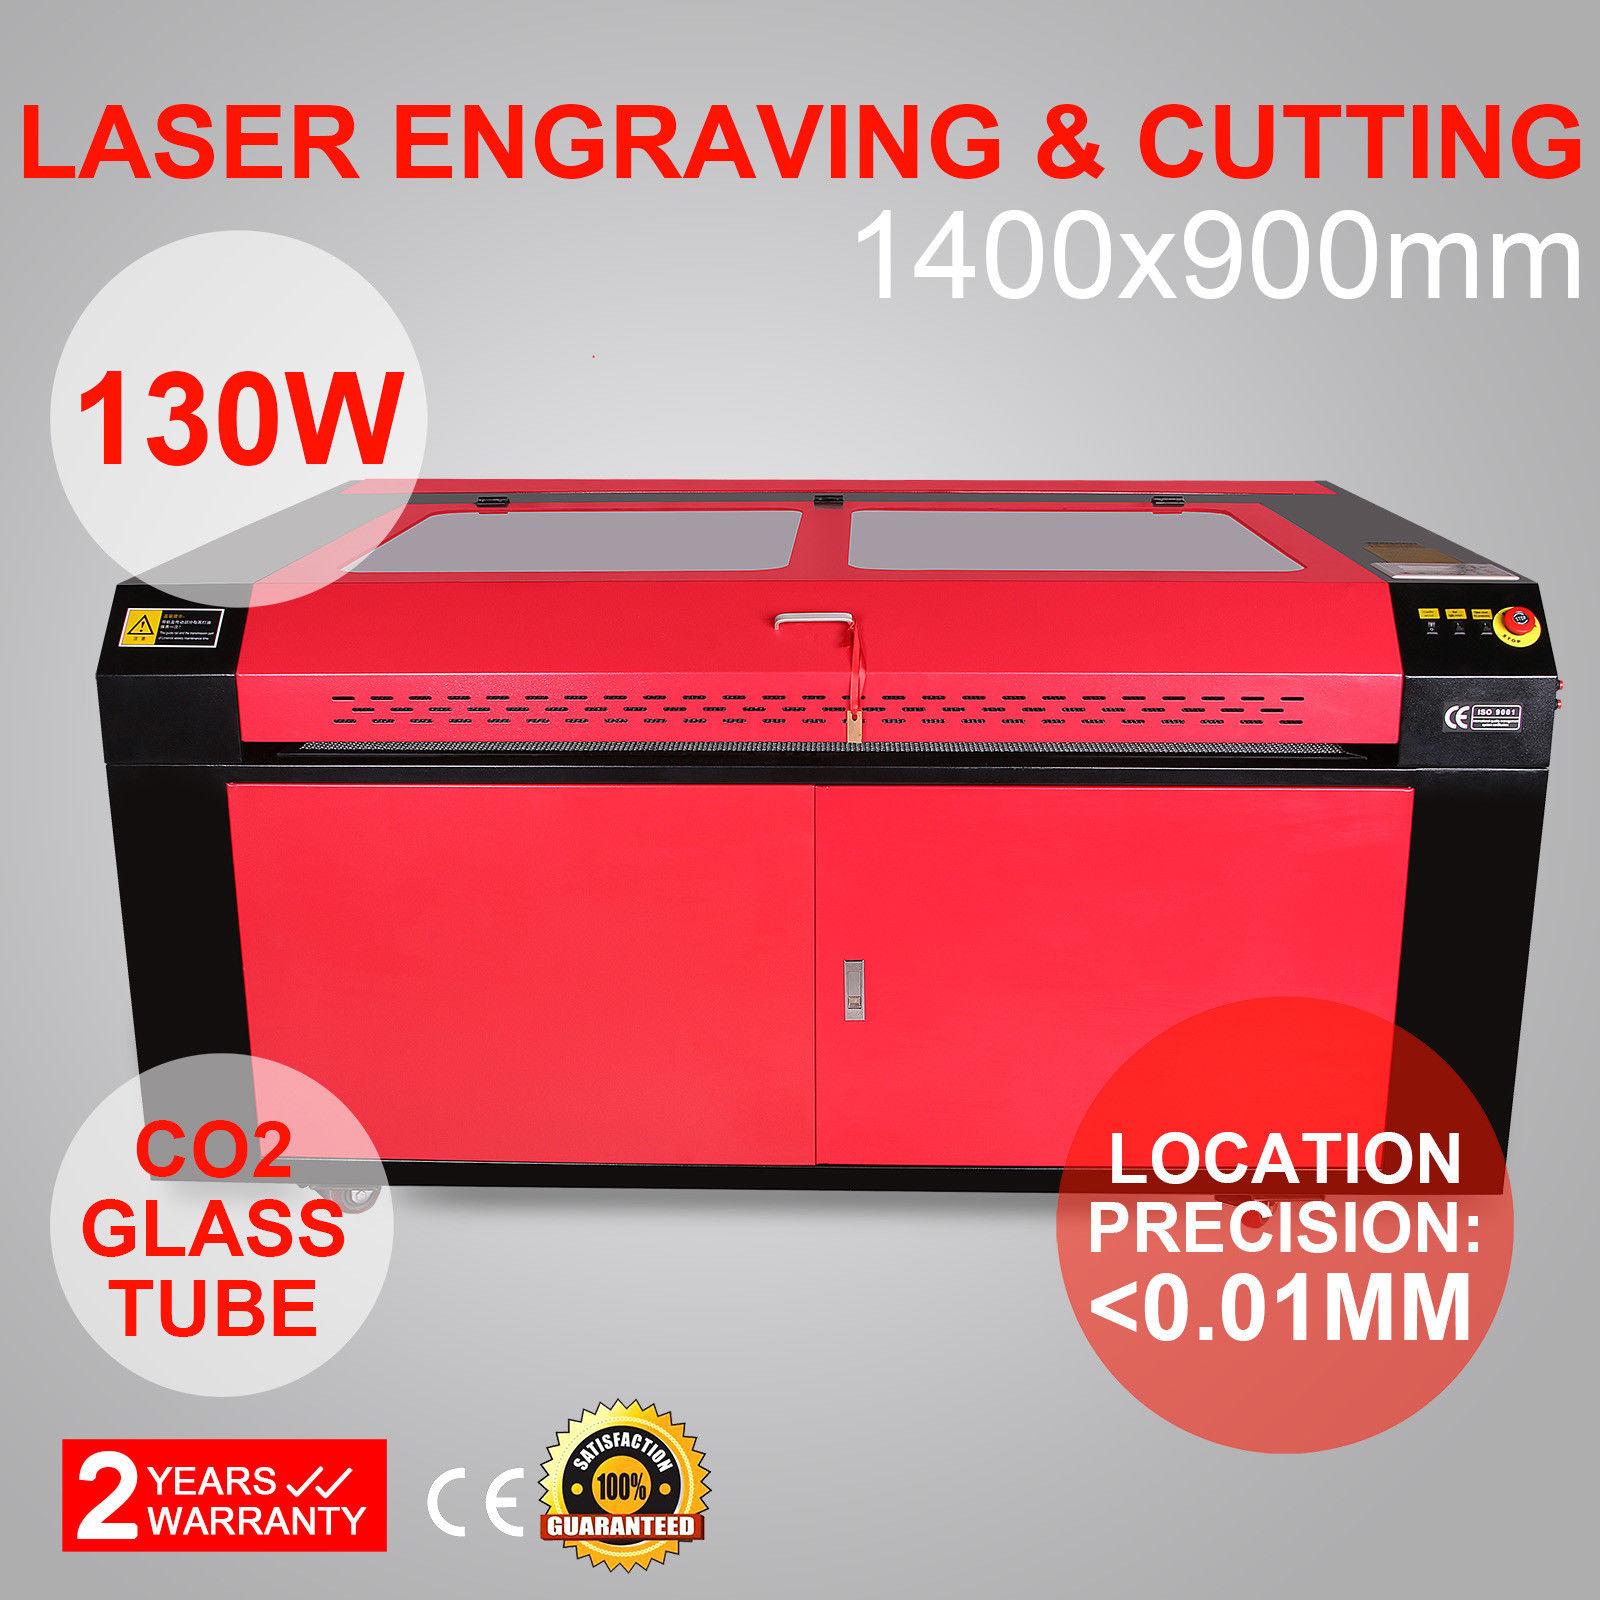 130W CO2 Laser Engraving Cutting Machine 1400x900mm Wood Working Crafts Printer Cutter USB Port